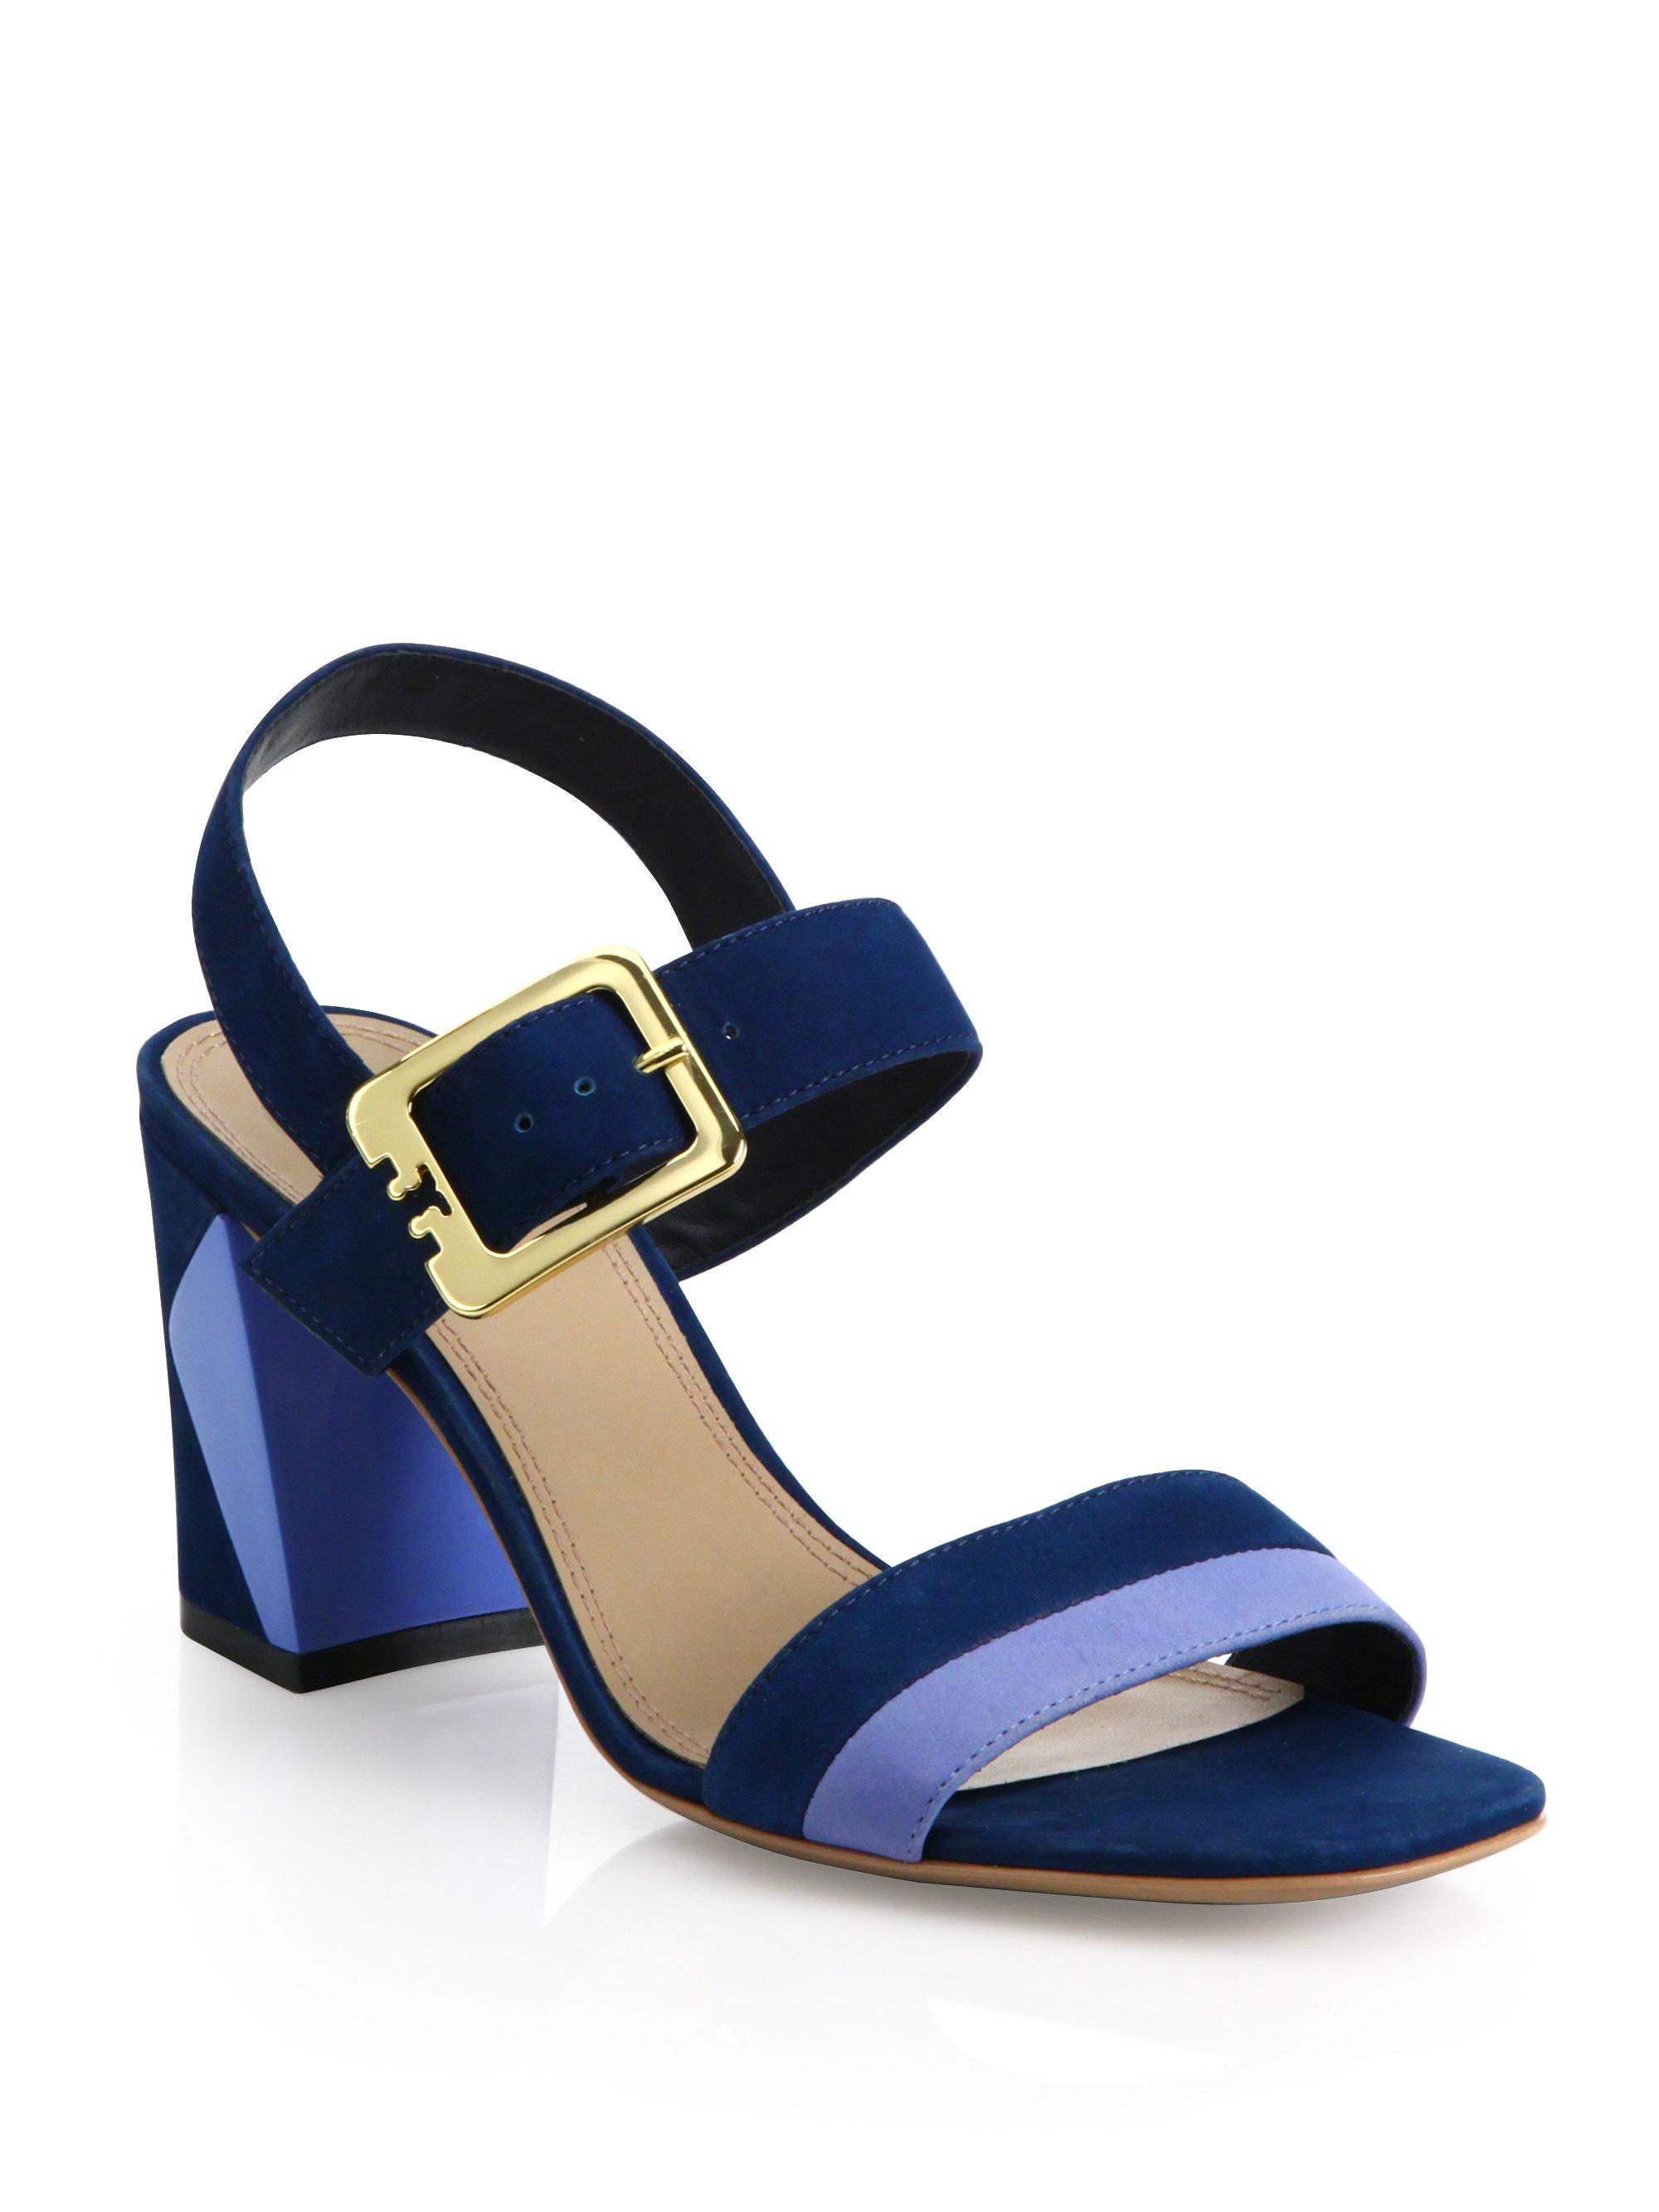 90fd155f808 Lyst - Tory Burch Palermo Sandal in Blue